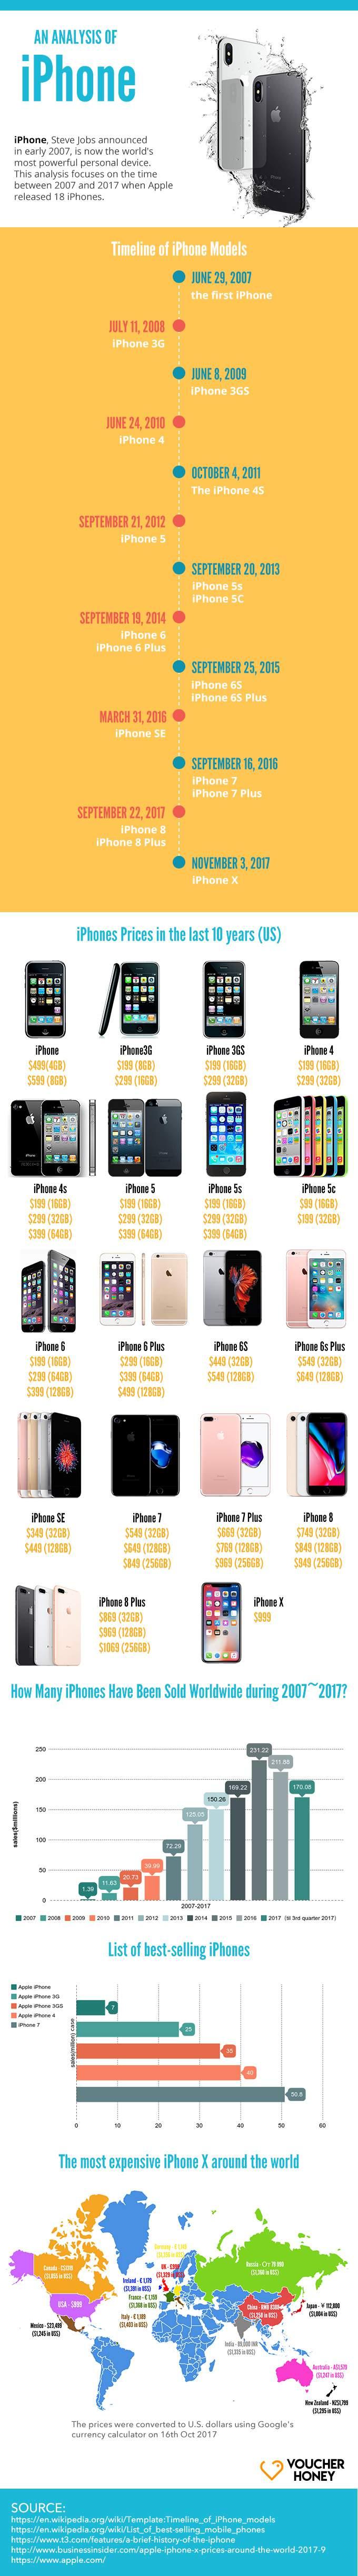 Analysis-of-iphone